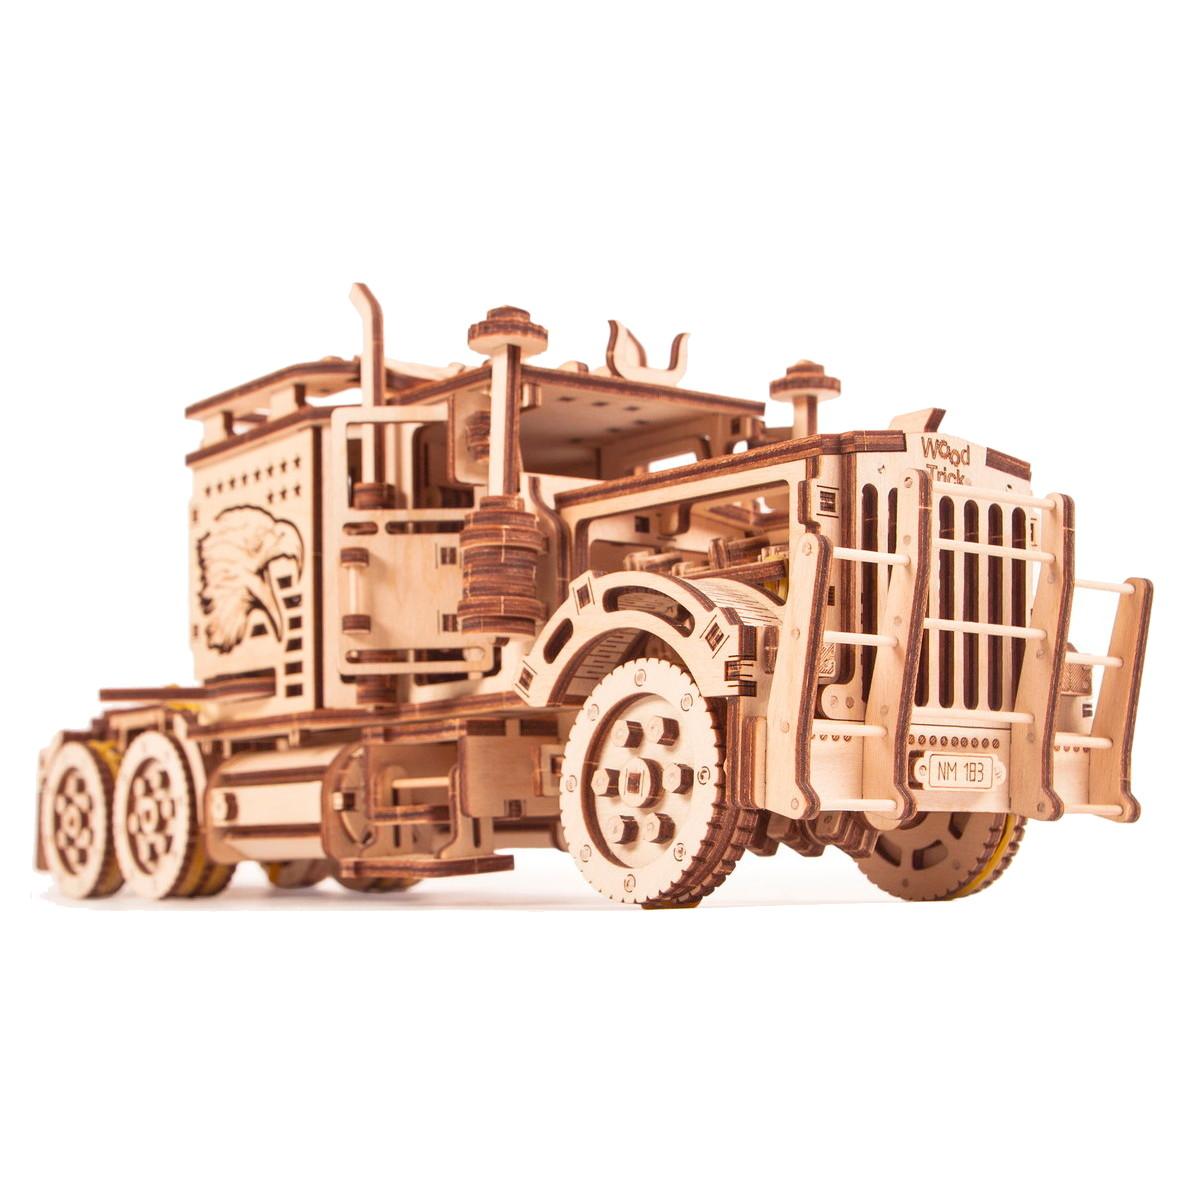 Wood Trick ウッドトリック ビッグリグ/大型トラック 3Dウッドパズル 子供も大人も楽しめる木製パズルの組立キット・工作キット